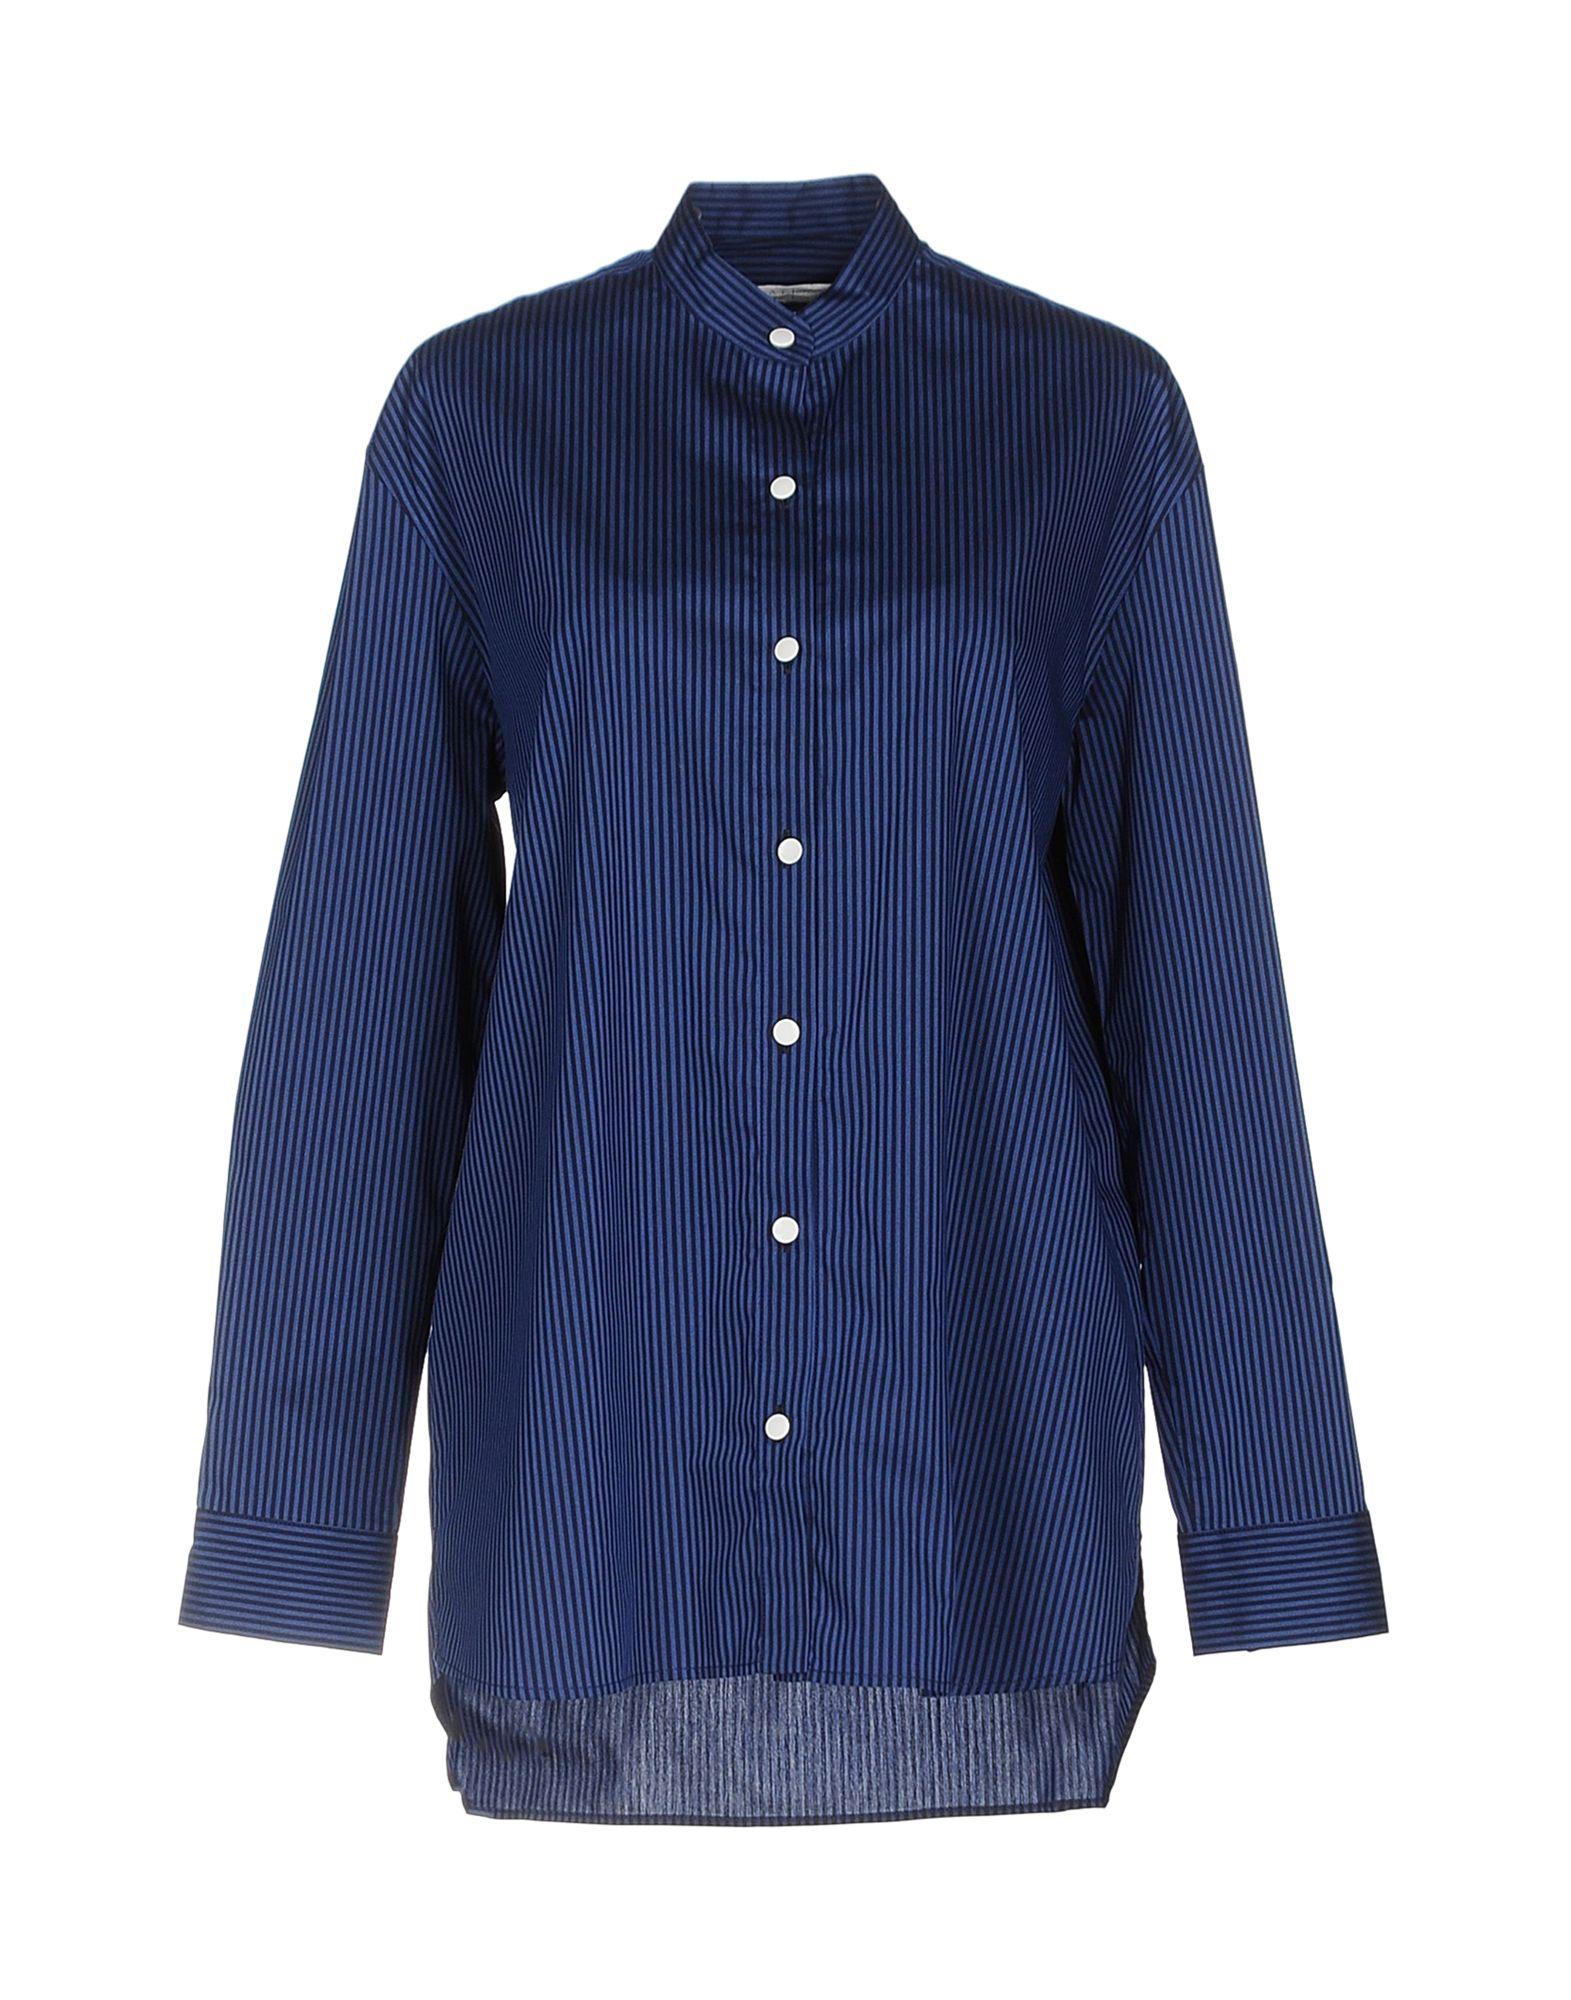 ATEA OCEANIE Striped Shirt in Blue